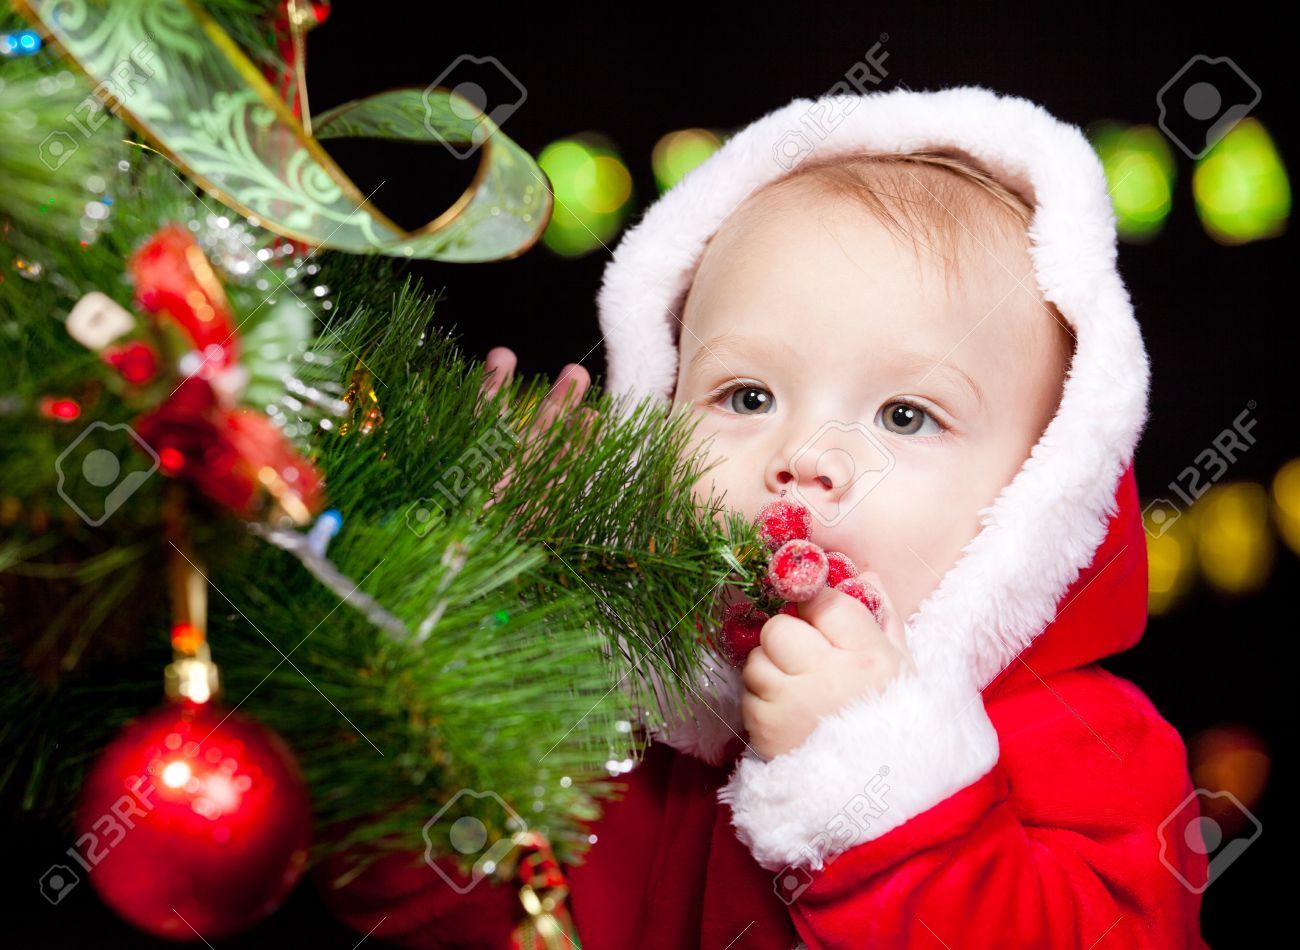 Portrait of Santa baby beside Christmas tree Stock Photo - 8372875